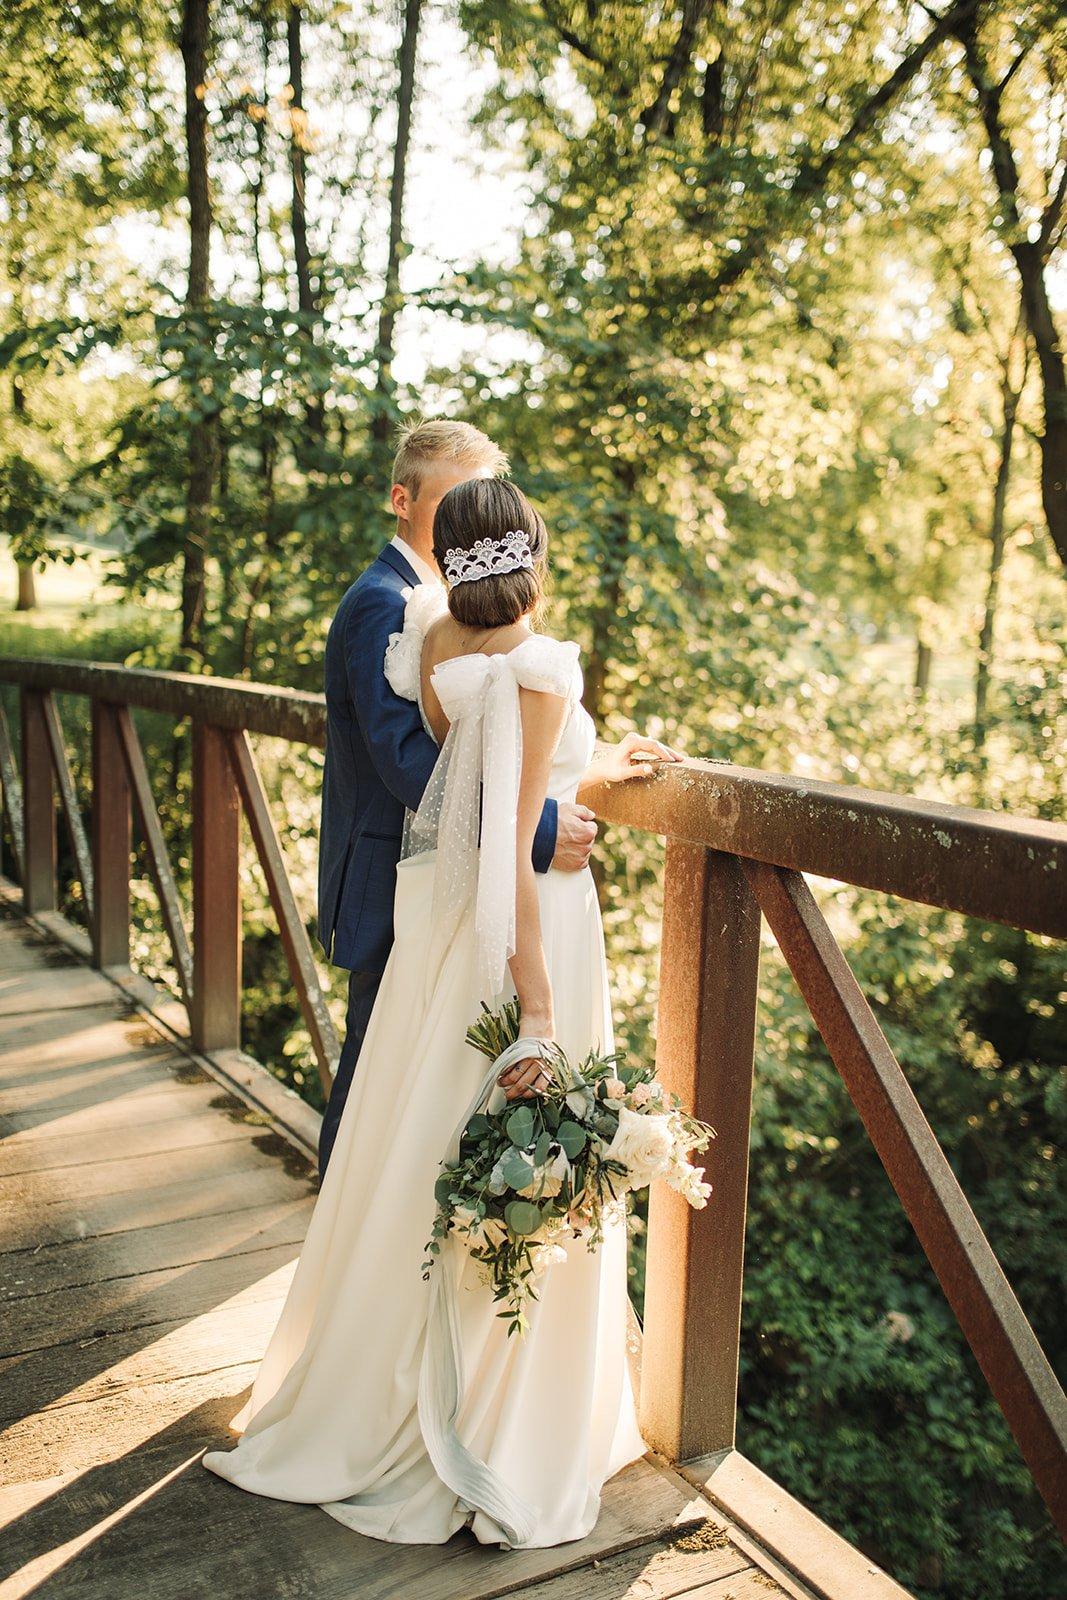 bride in her wedding dress with details